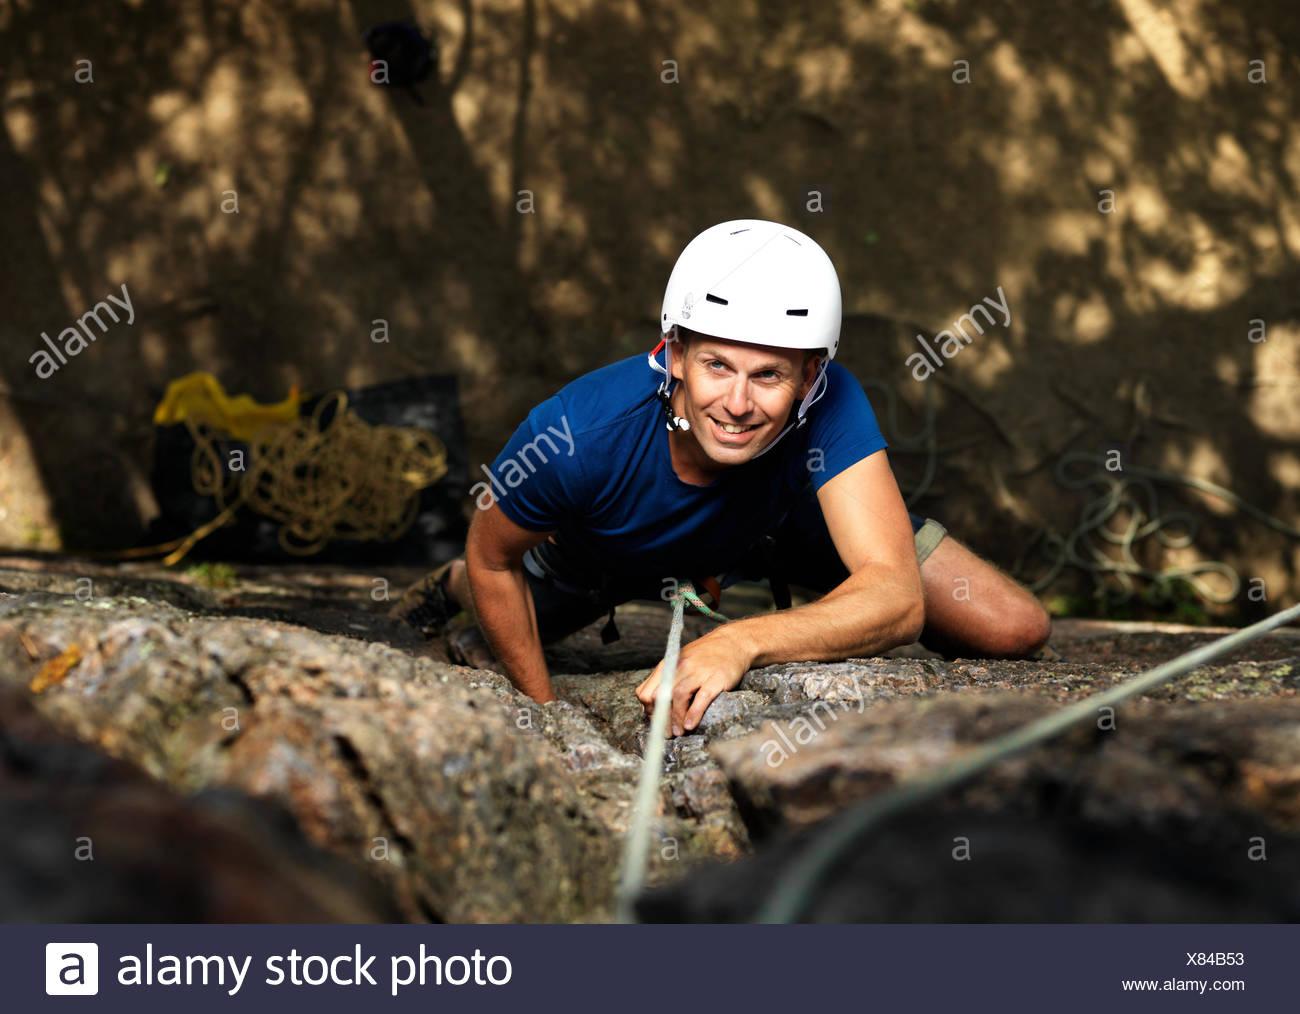 Sweden, Ostergotland, Agelsjon, Smiling man climbing rock - Stock Image